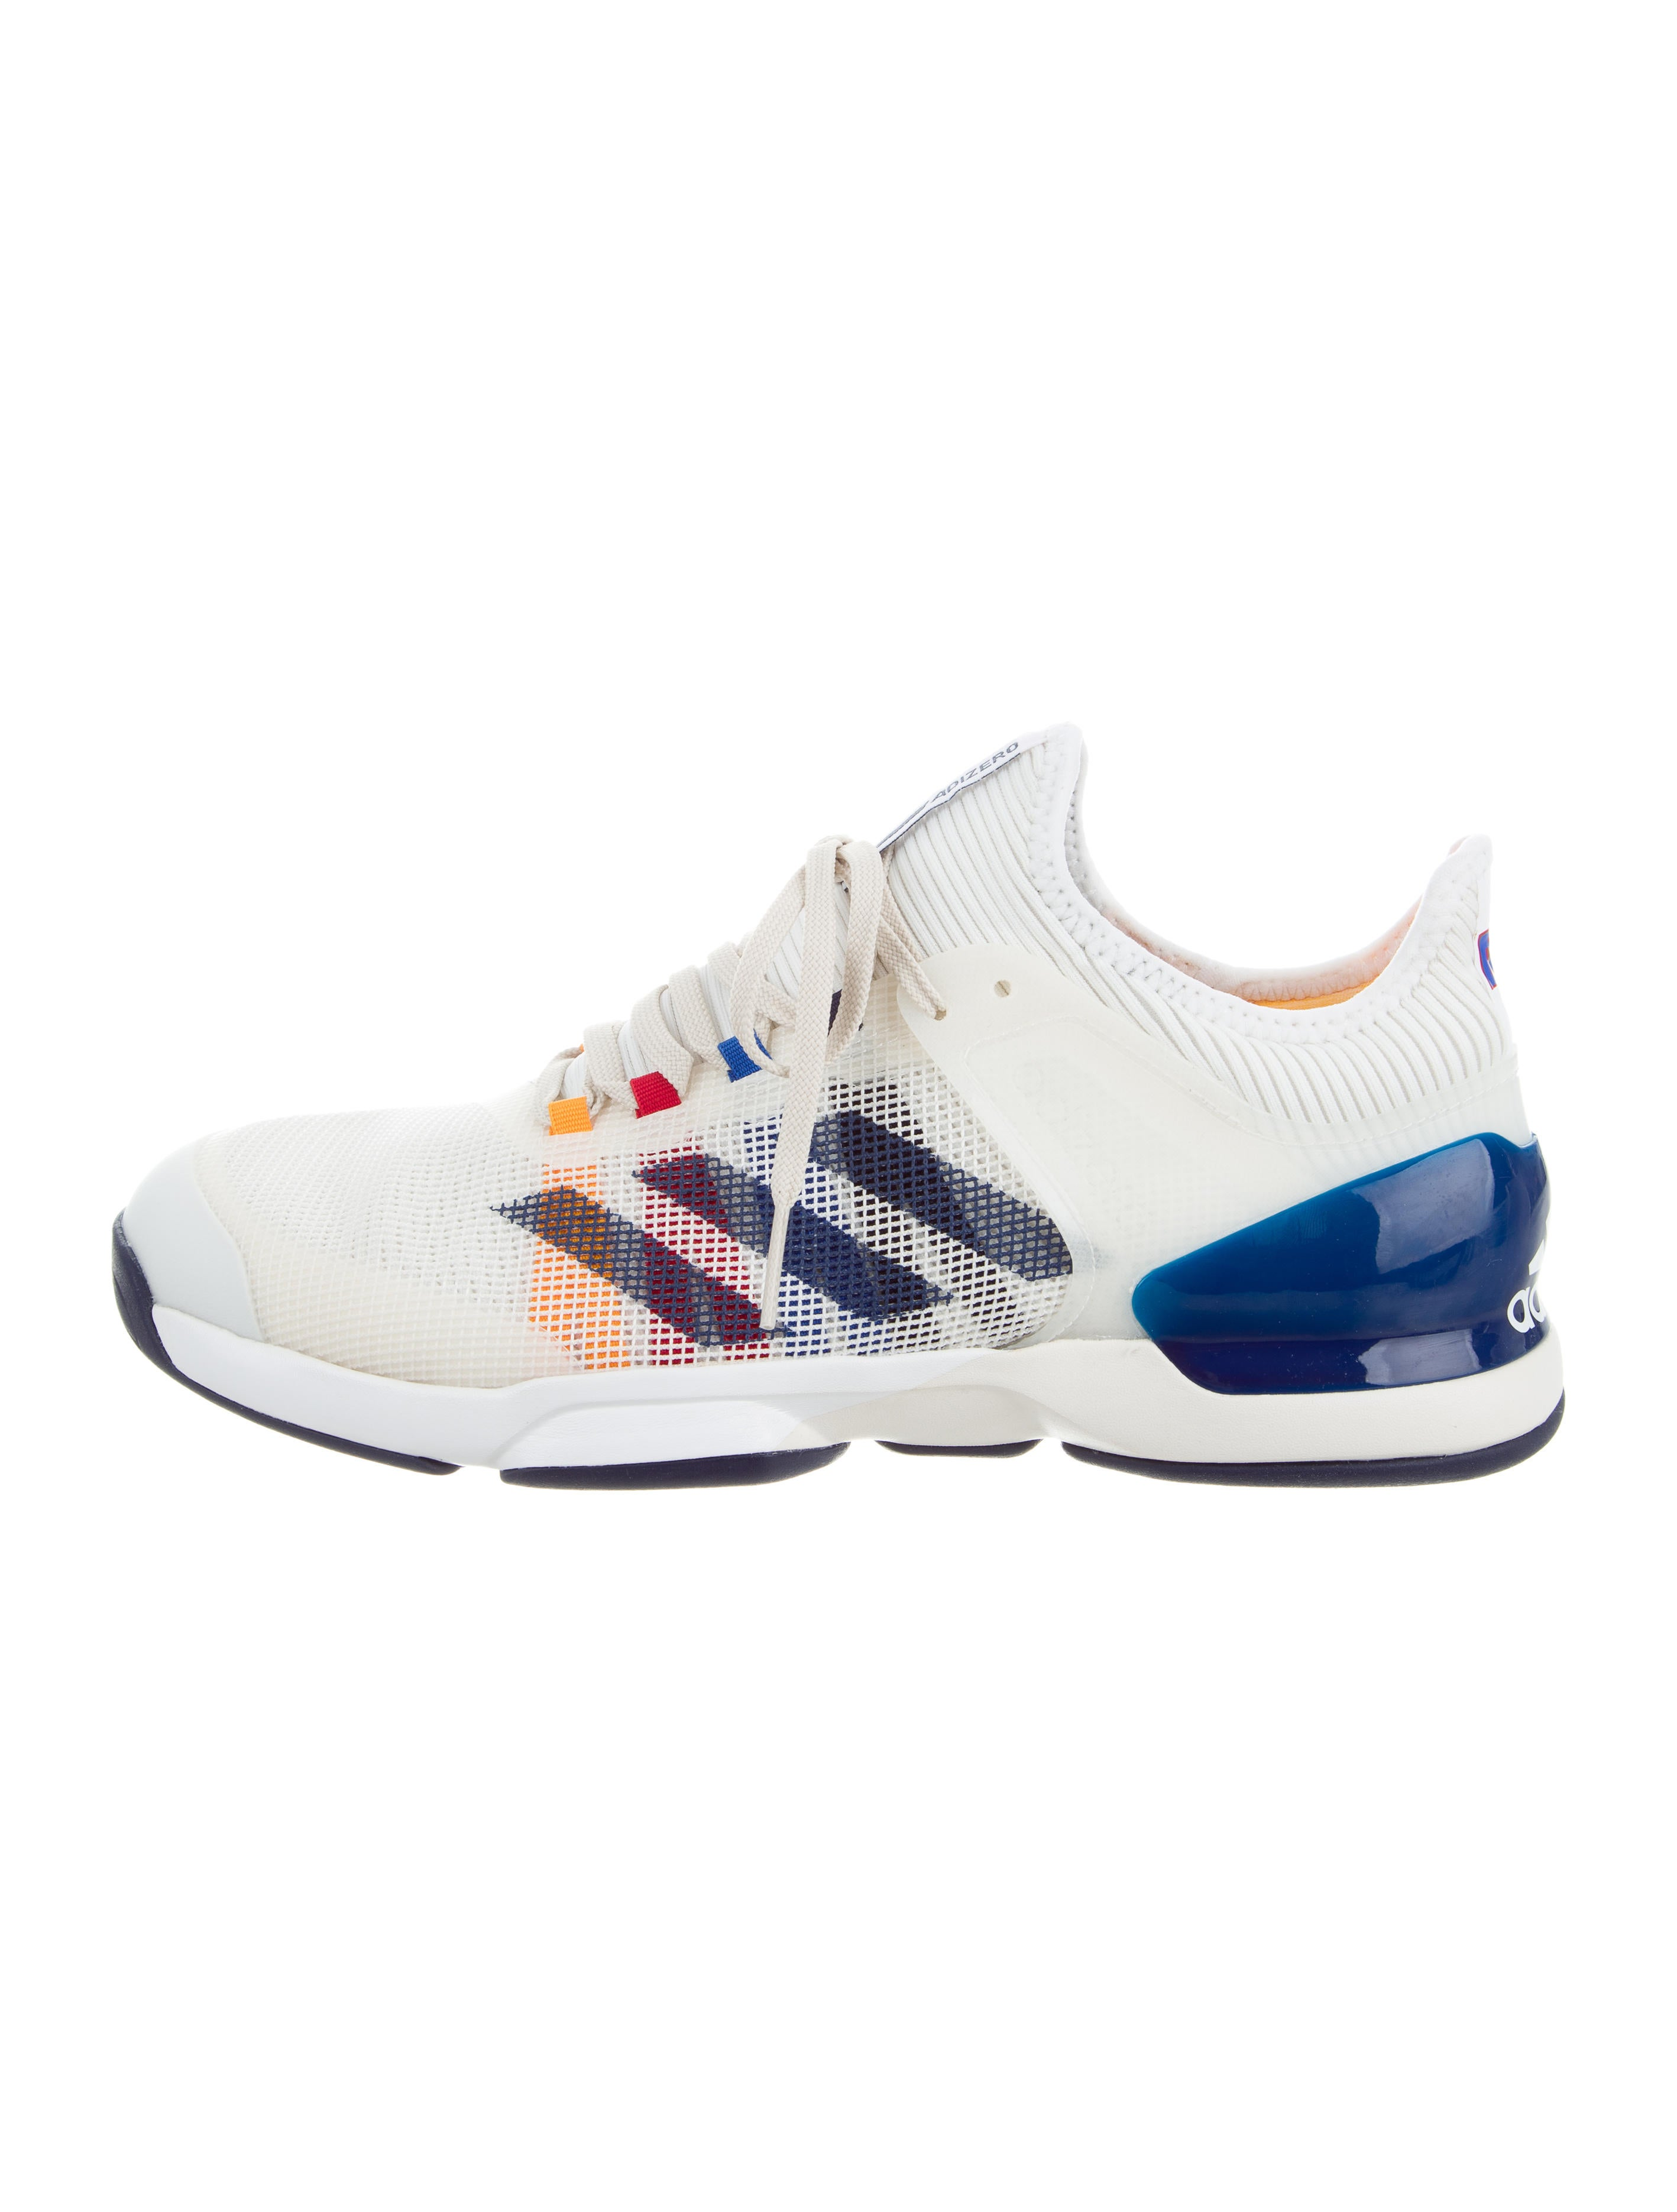 adidas men's adizero ubersonic 2 sneakers multicolour size 7 uk